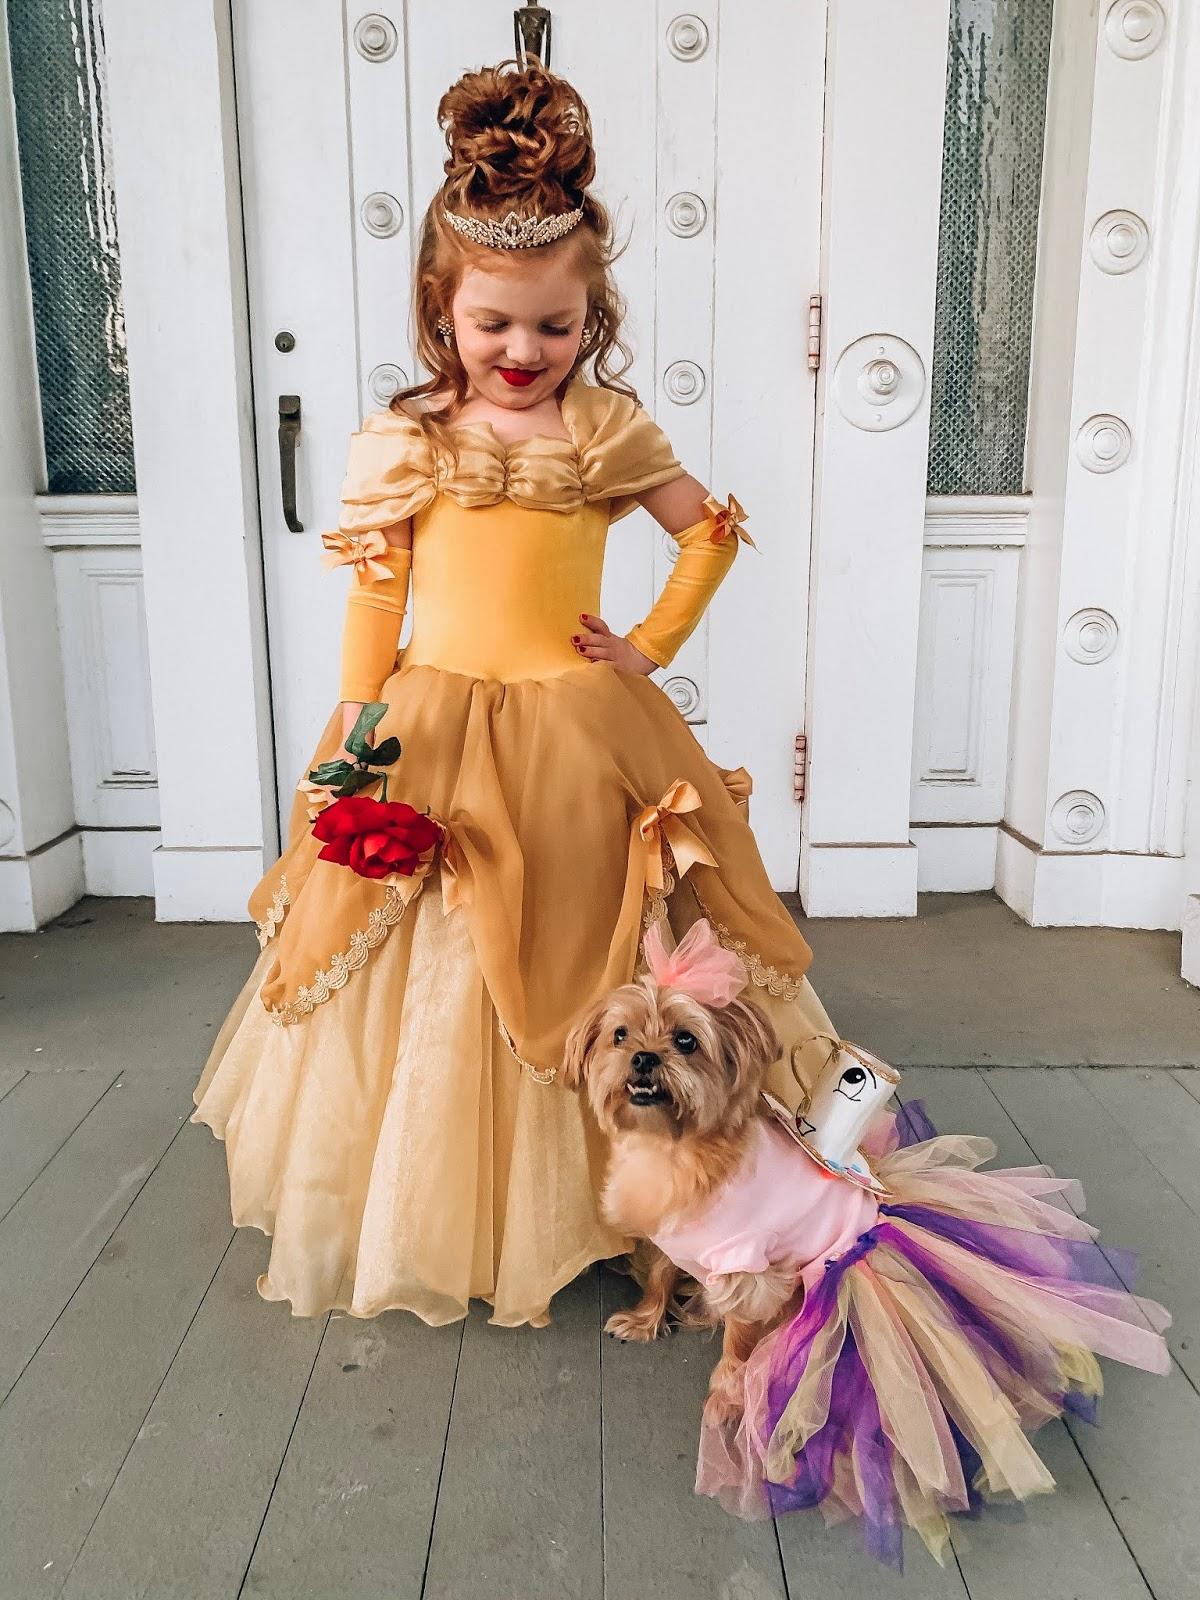 Halloween 2019: A Beauty & The Beast Halloween - Something Delightful Blog #familycostumeideas #beautyandthebeast #halloween #costumeideas